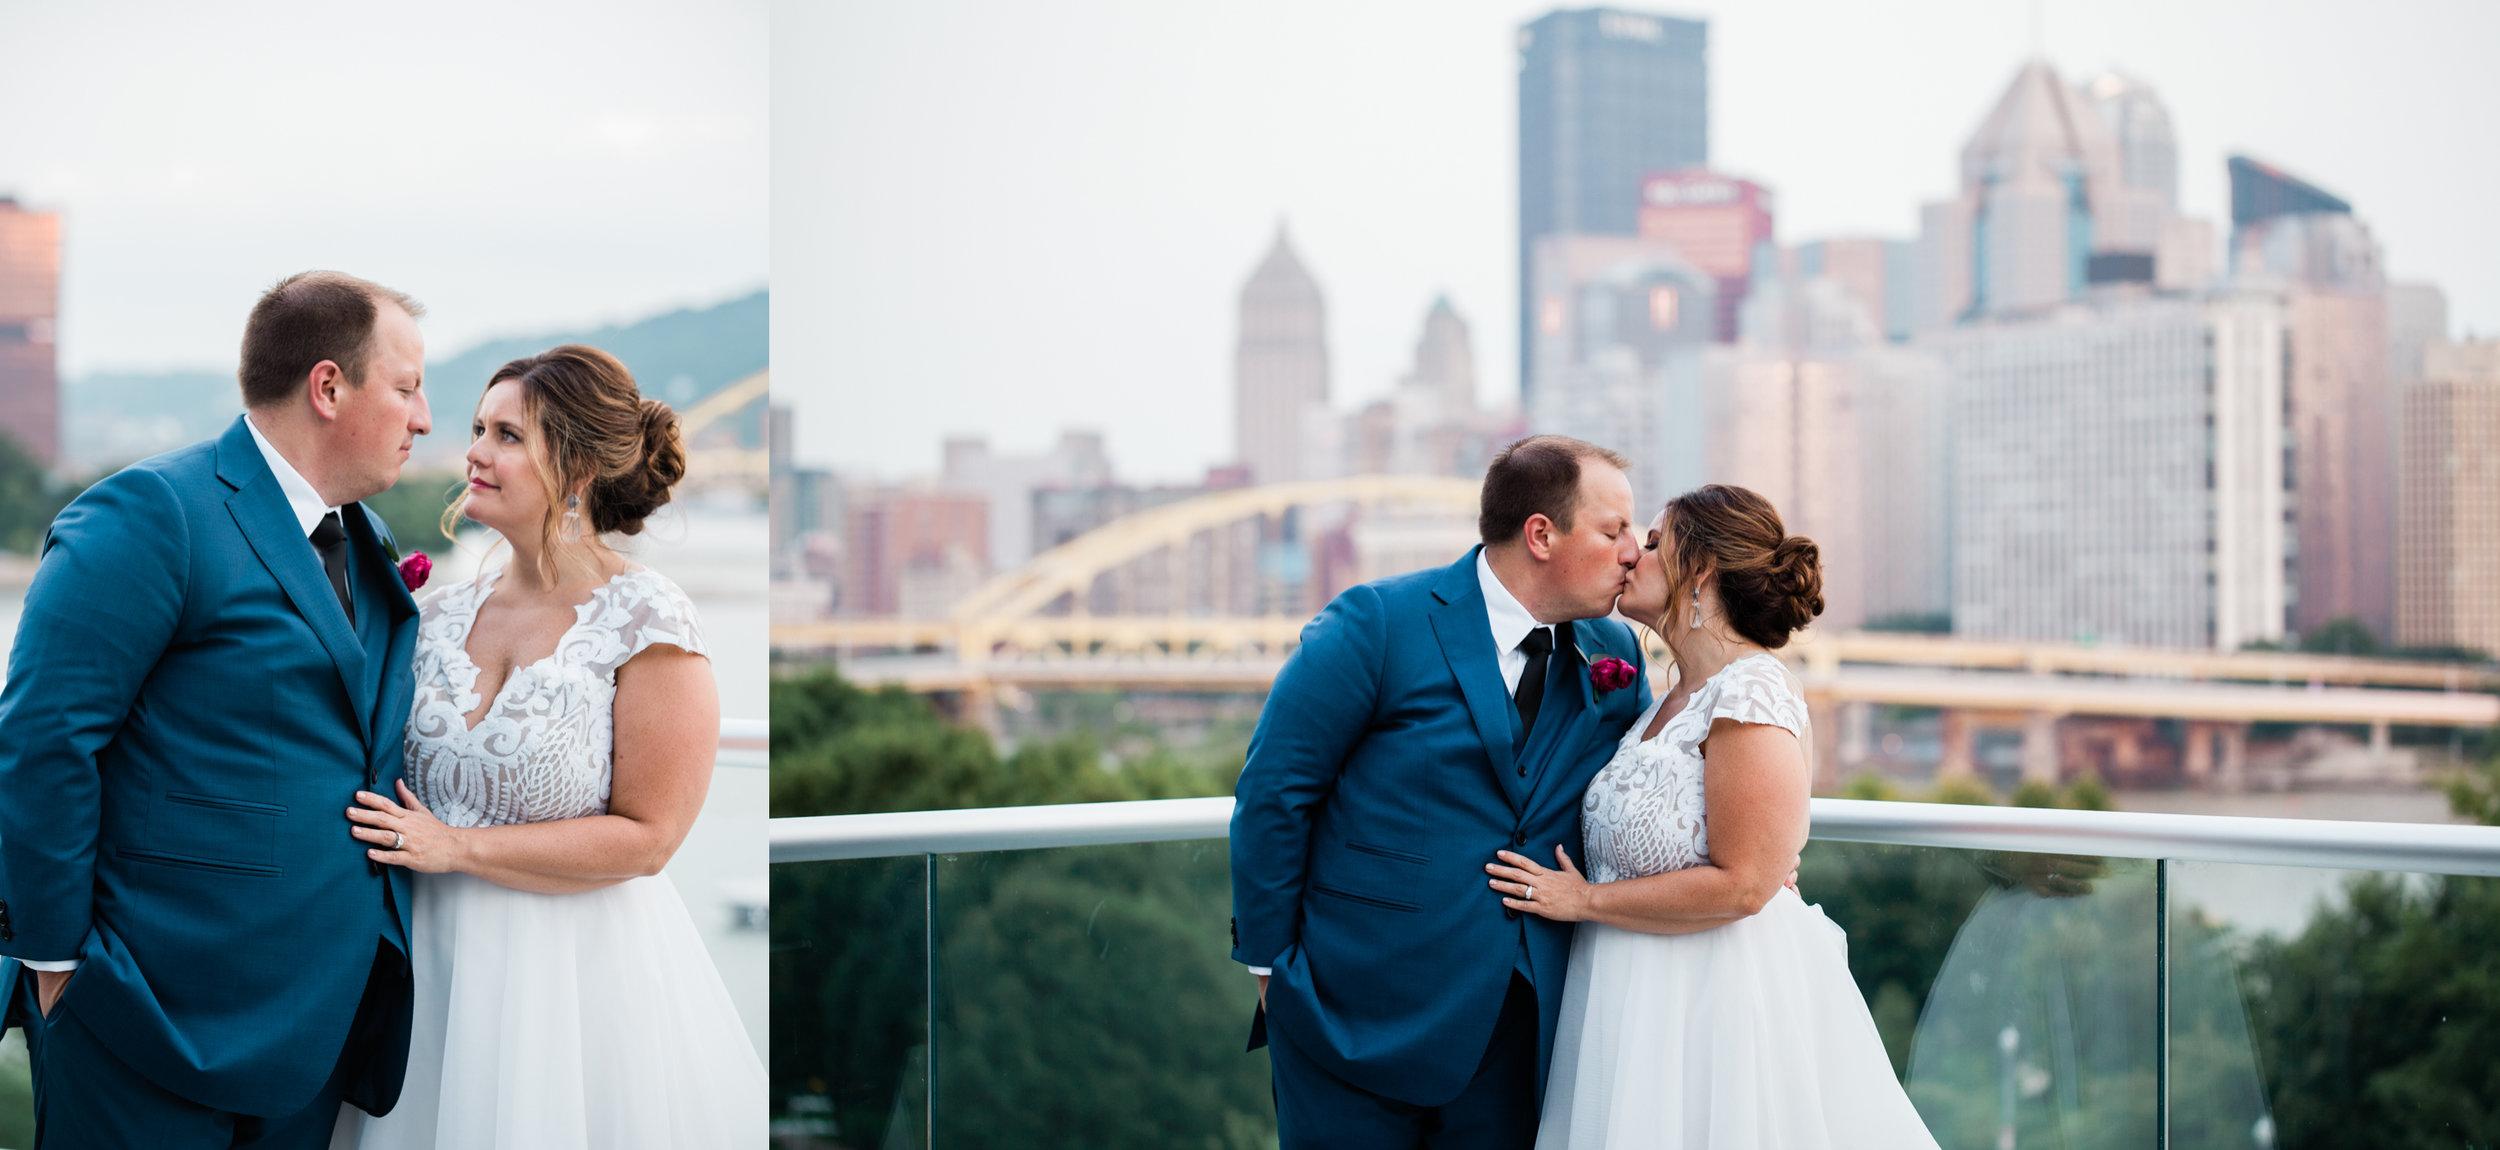 Pointview Hall Pittsburgh Wedding Photographer.jpg